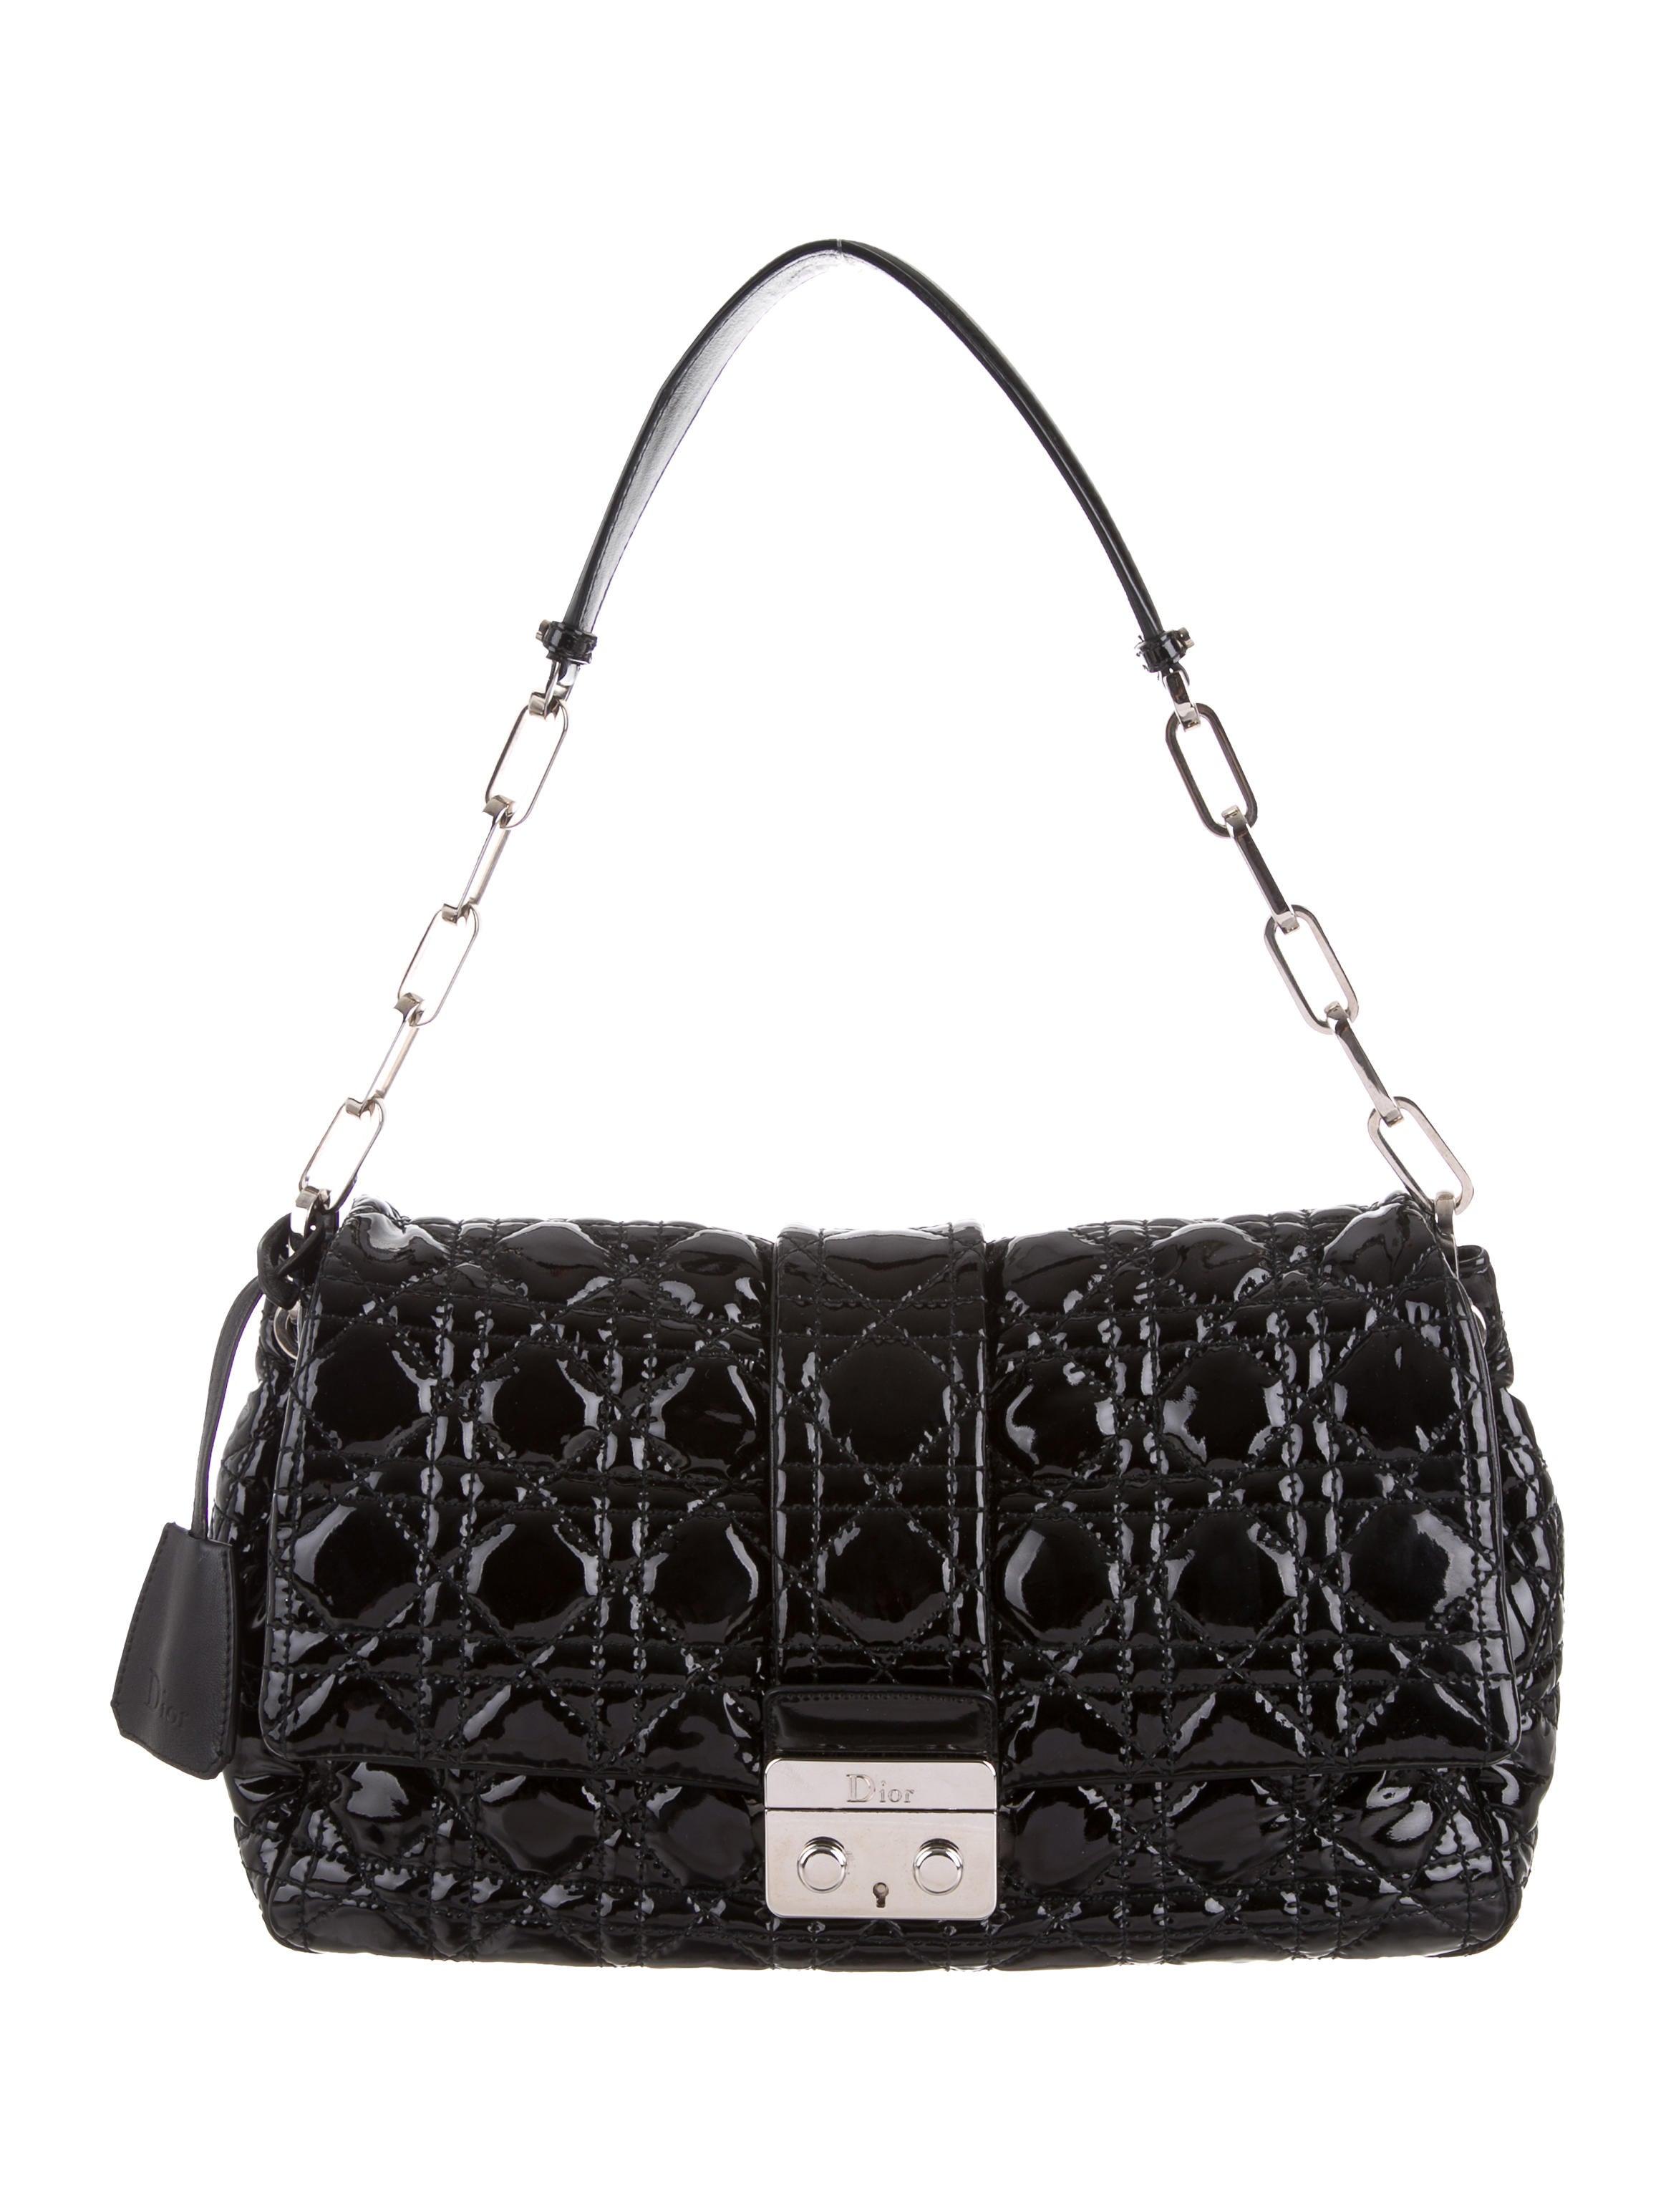 Christian Dior Cannage Miss Dior Bag - Handbags - CHR36919   The ...